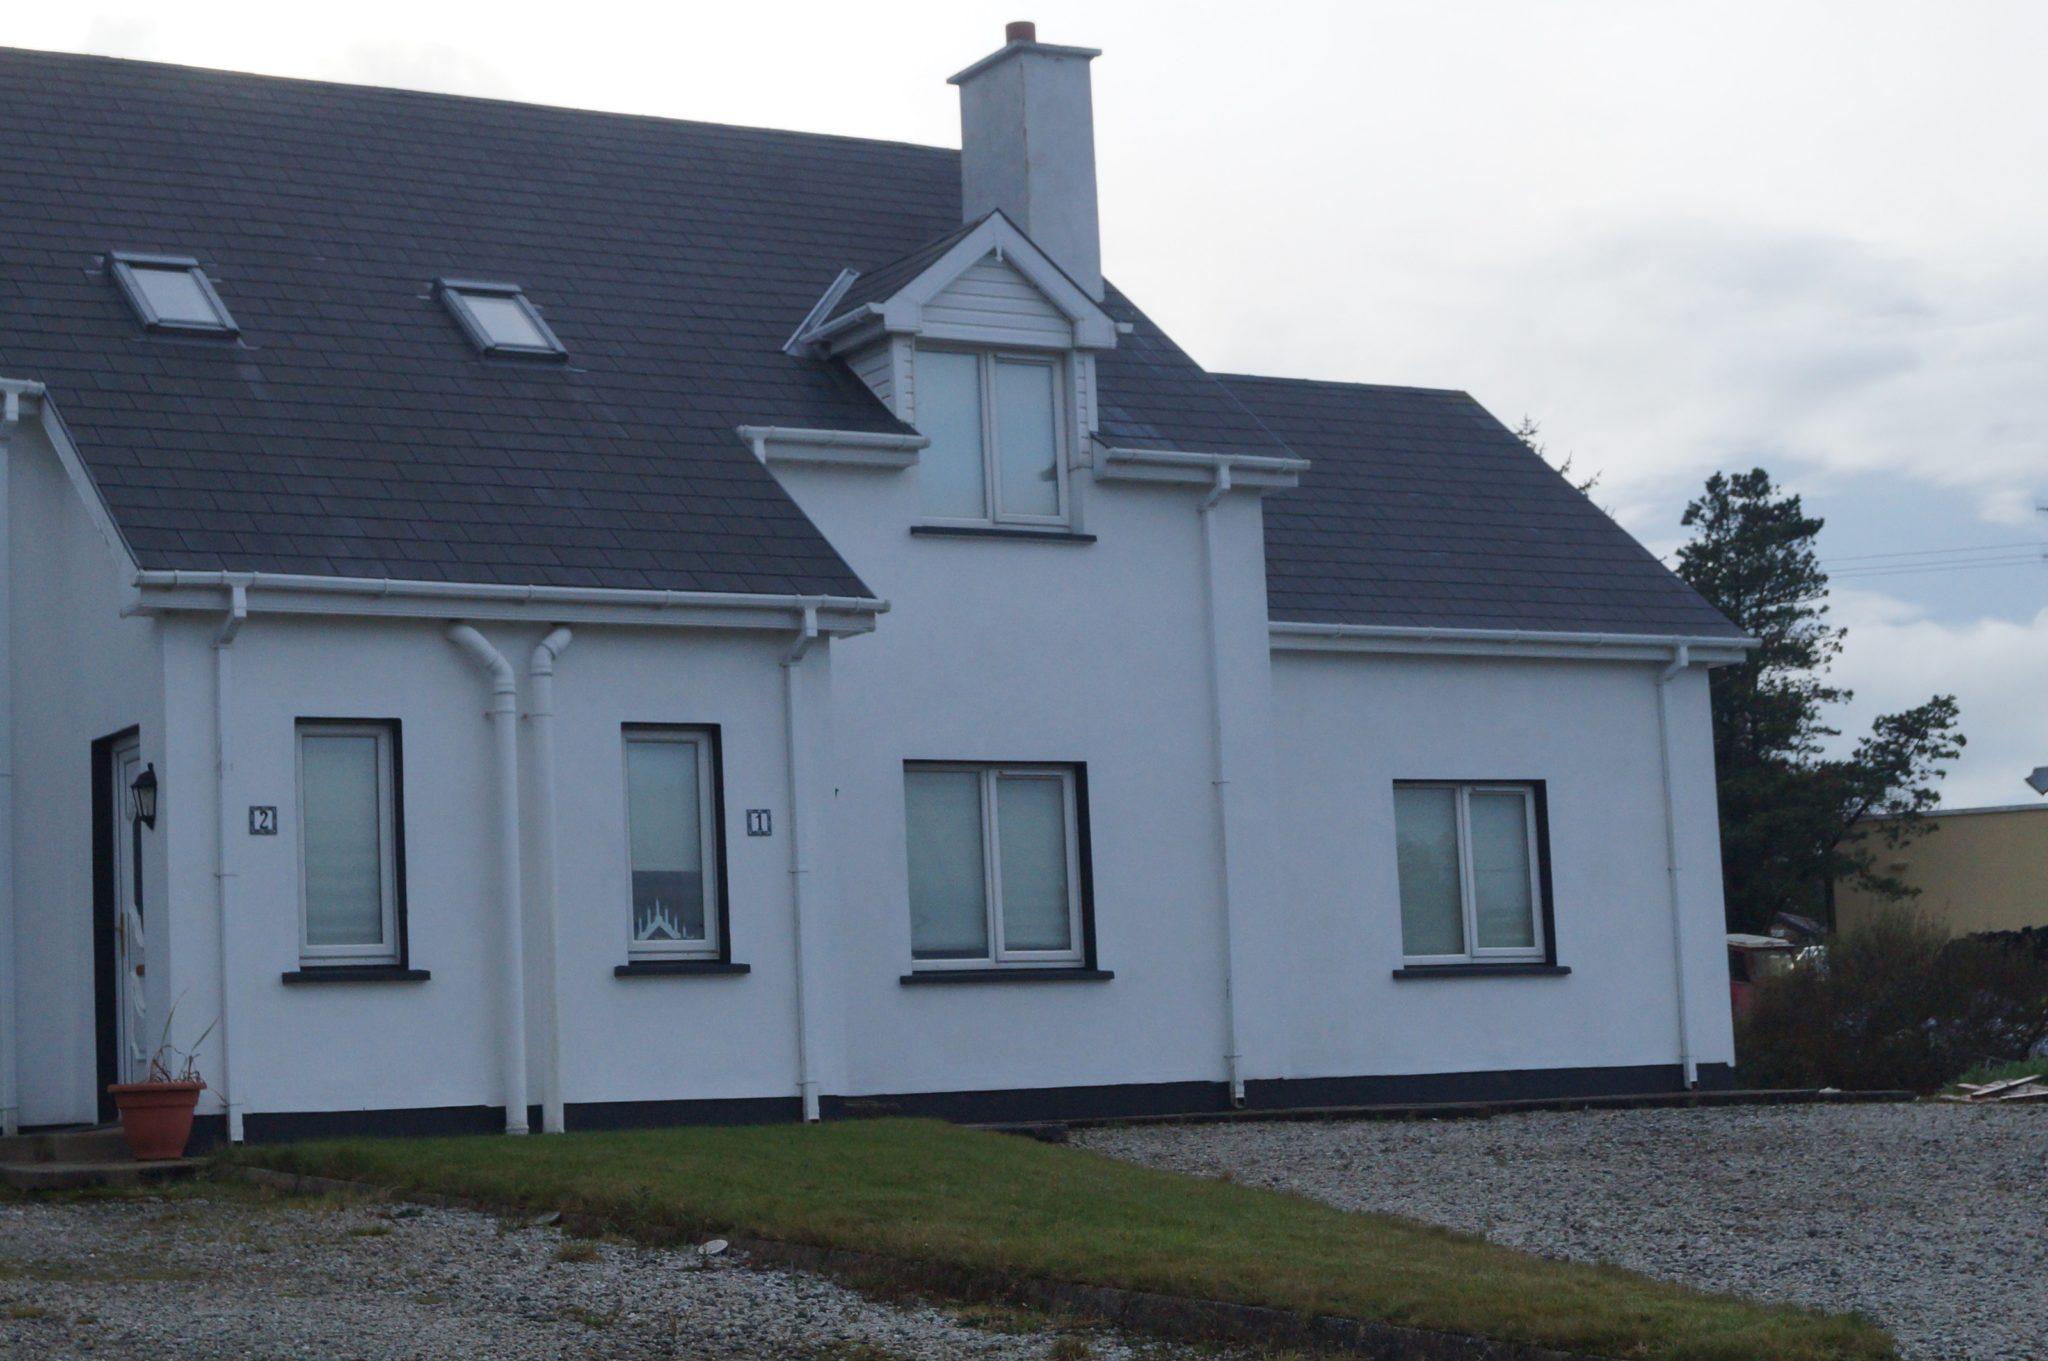 No. 1 Croí na Gaeltachta, Glassagh, Derrybeg, Co. Donegal